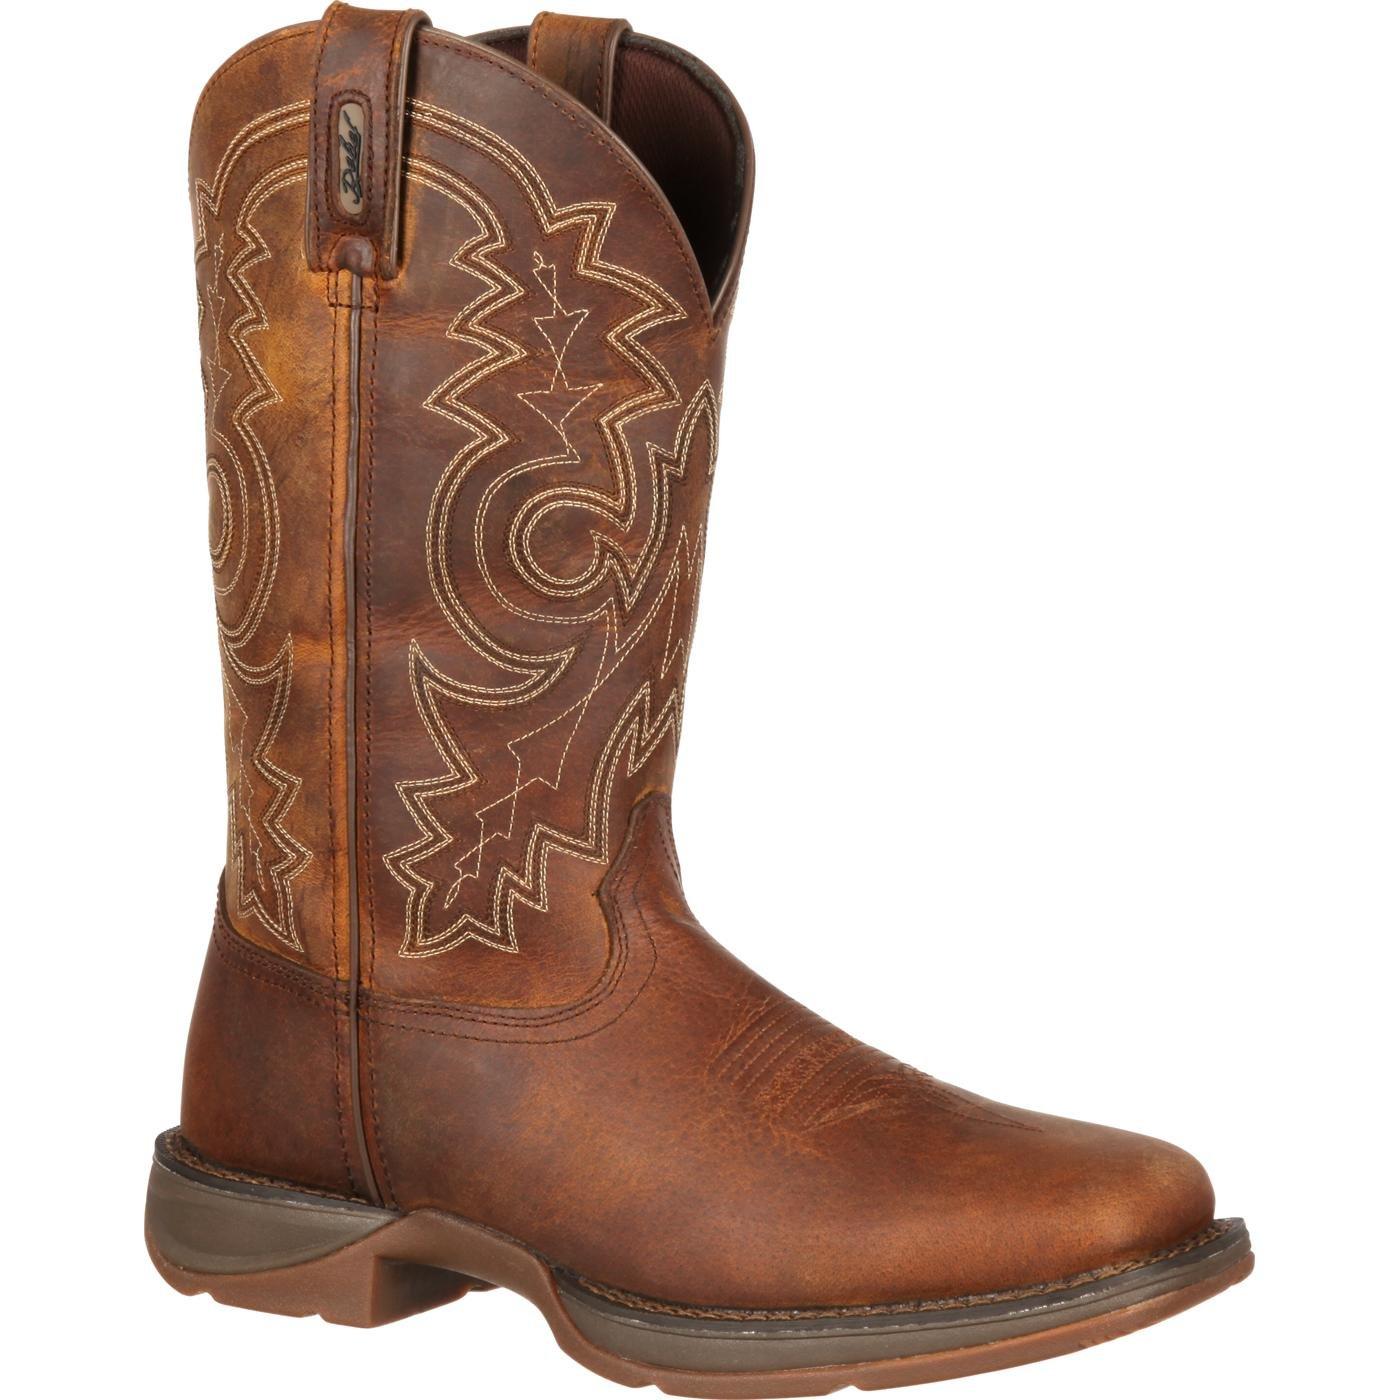 Durango Men's DB4443 Western Boot, Brown, 12 2E US